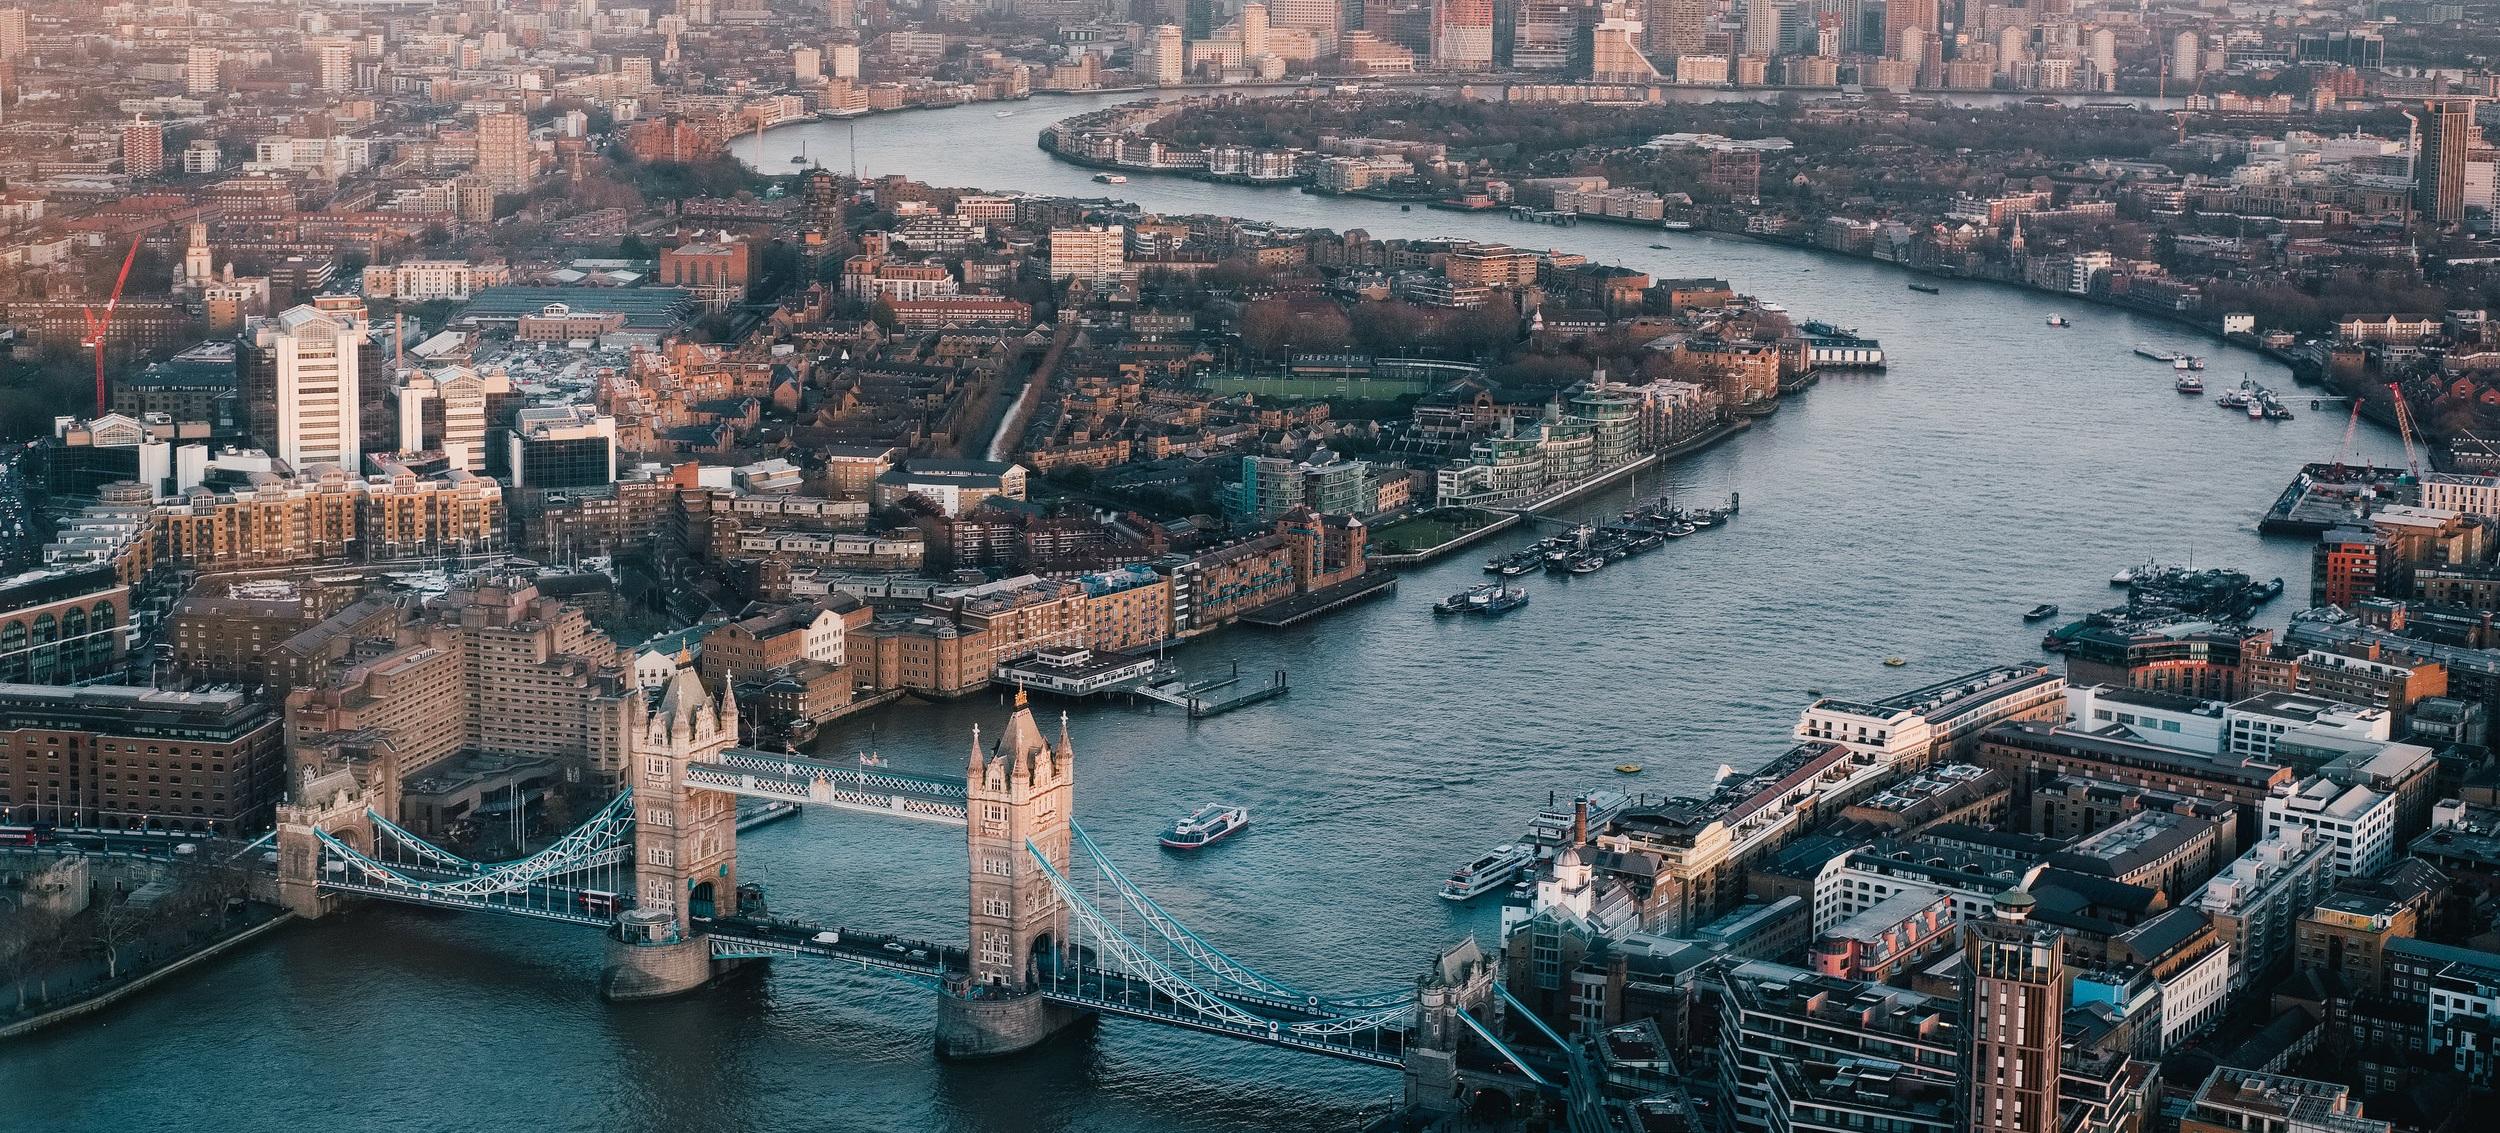 Tower Bridge and the River Thames, London, England, United Kingdom